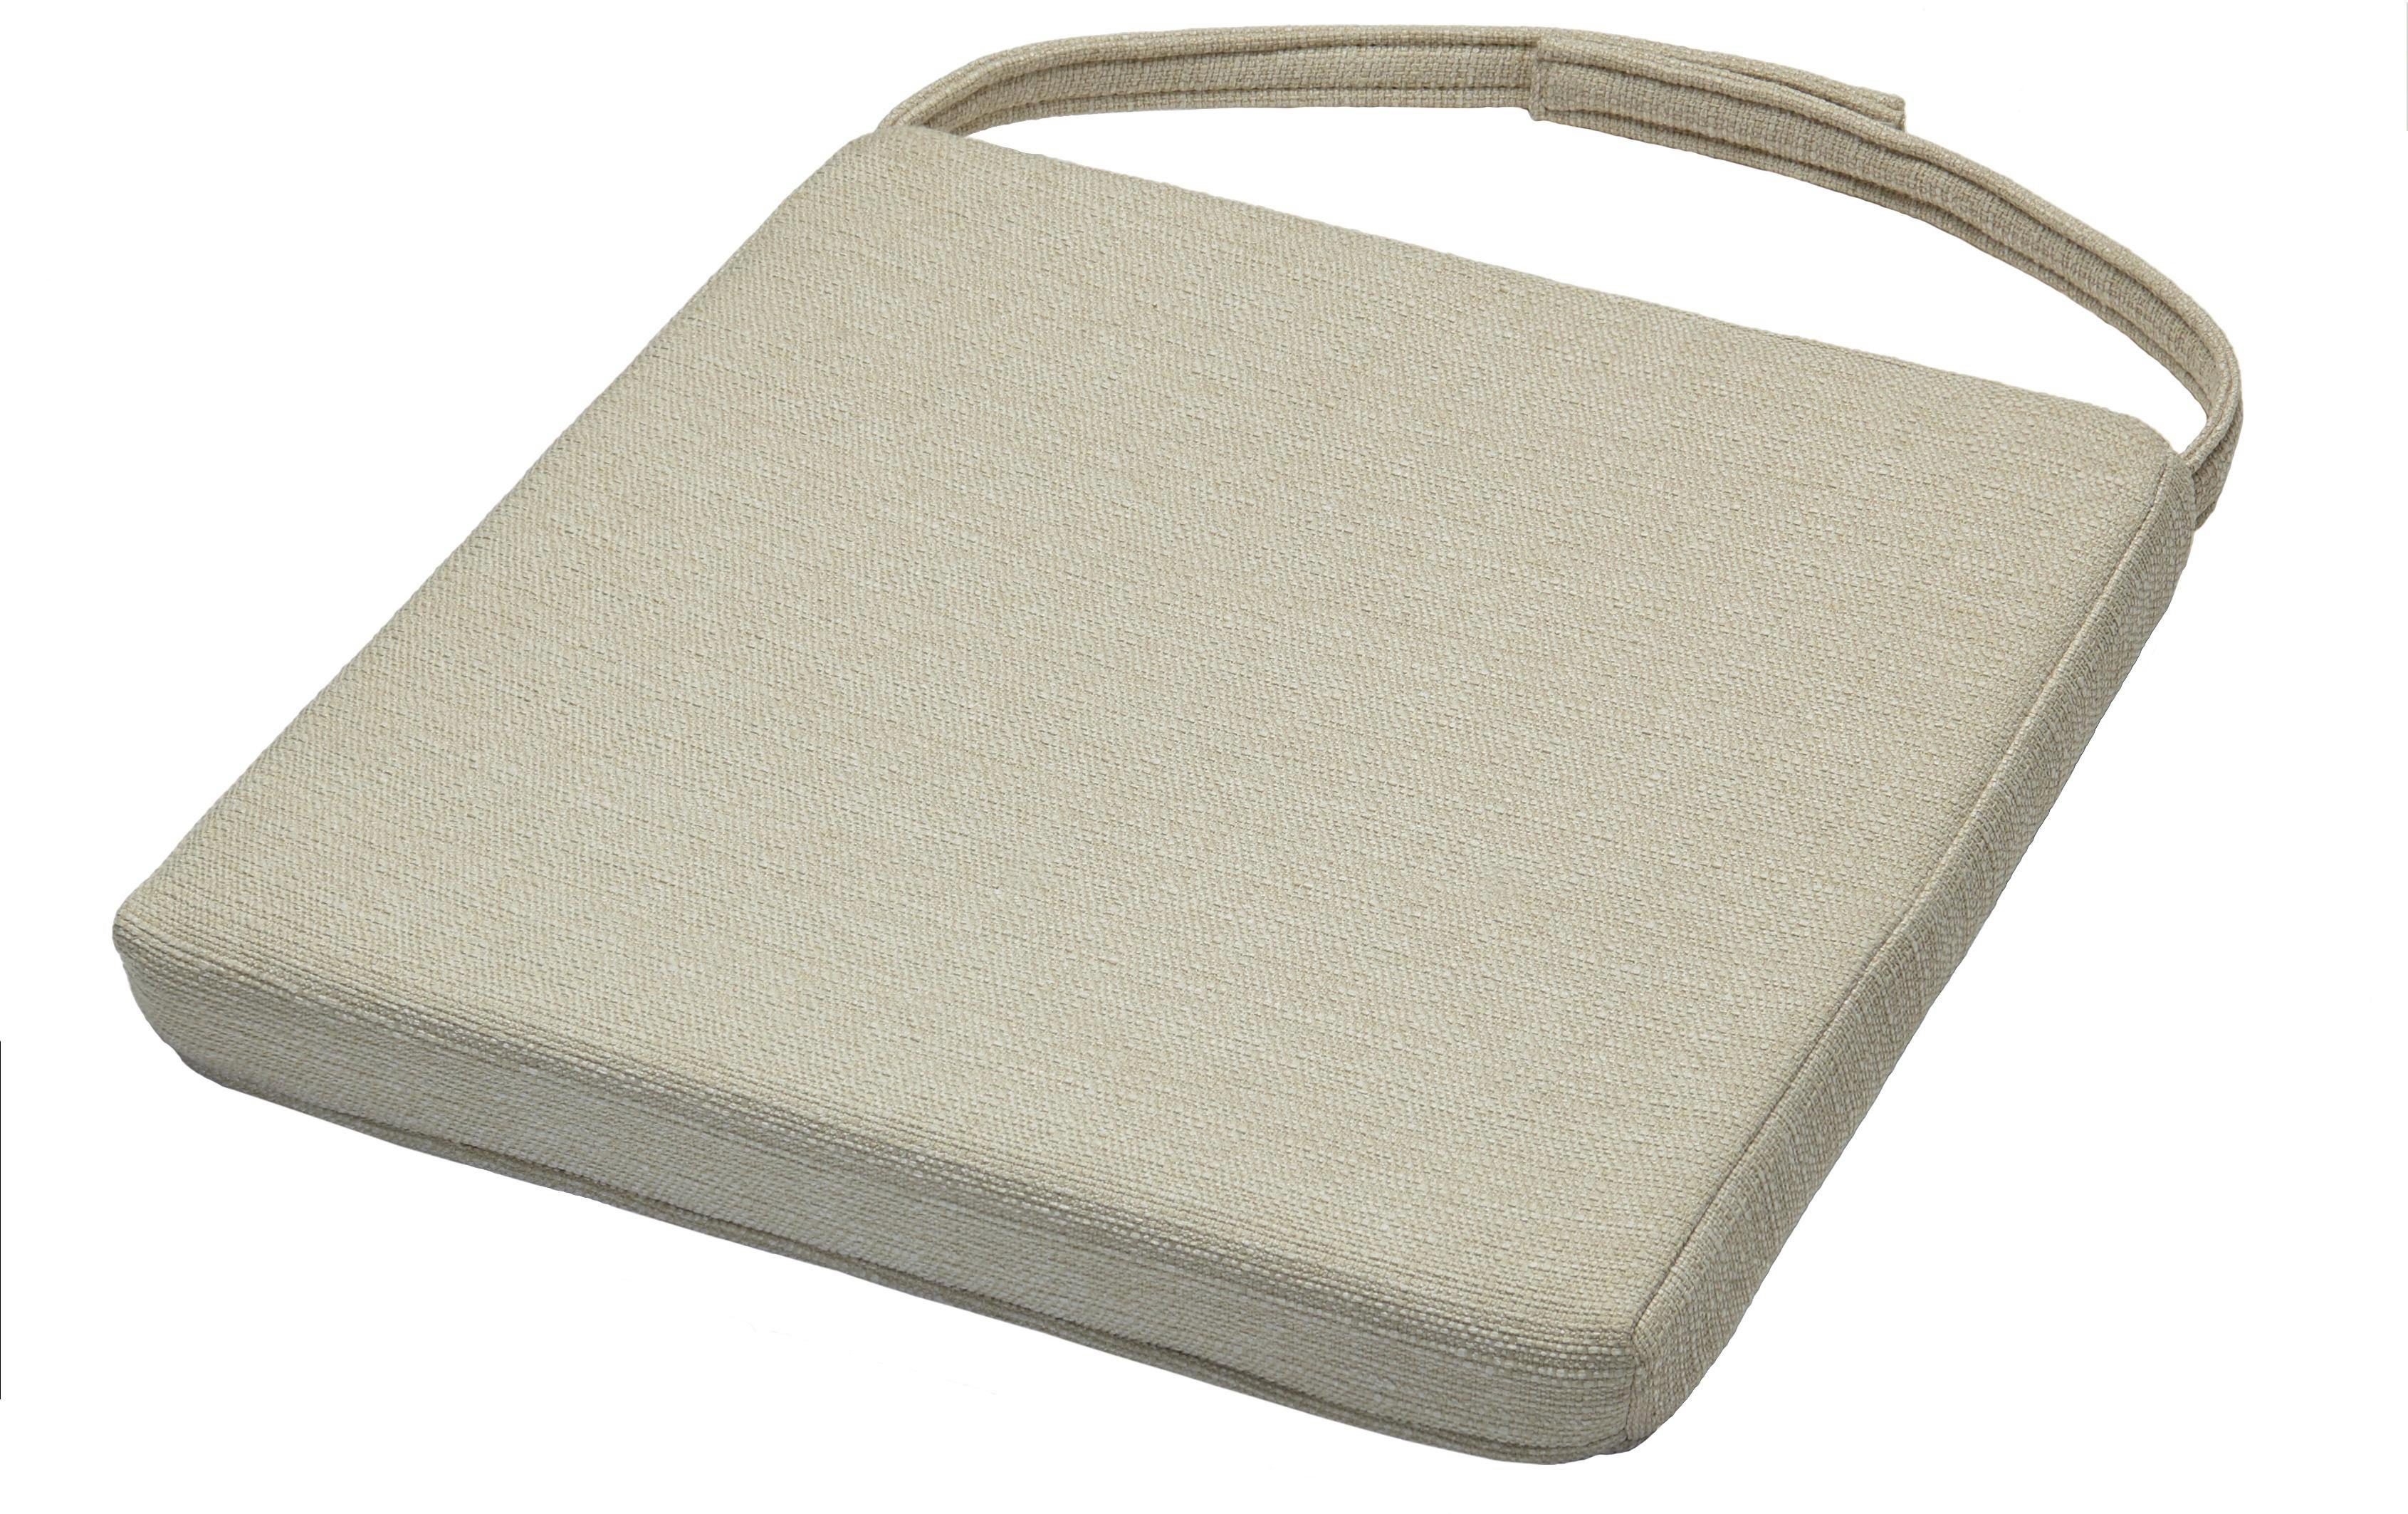 Sitzkissen in Grau, ca. 46x5x40cm - Grau, Textil (46/42/5/40cm) - ZANDIARA